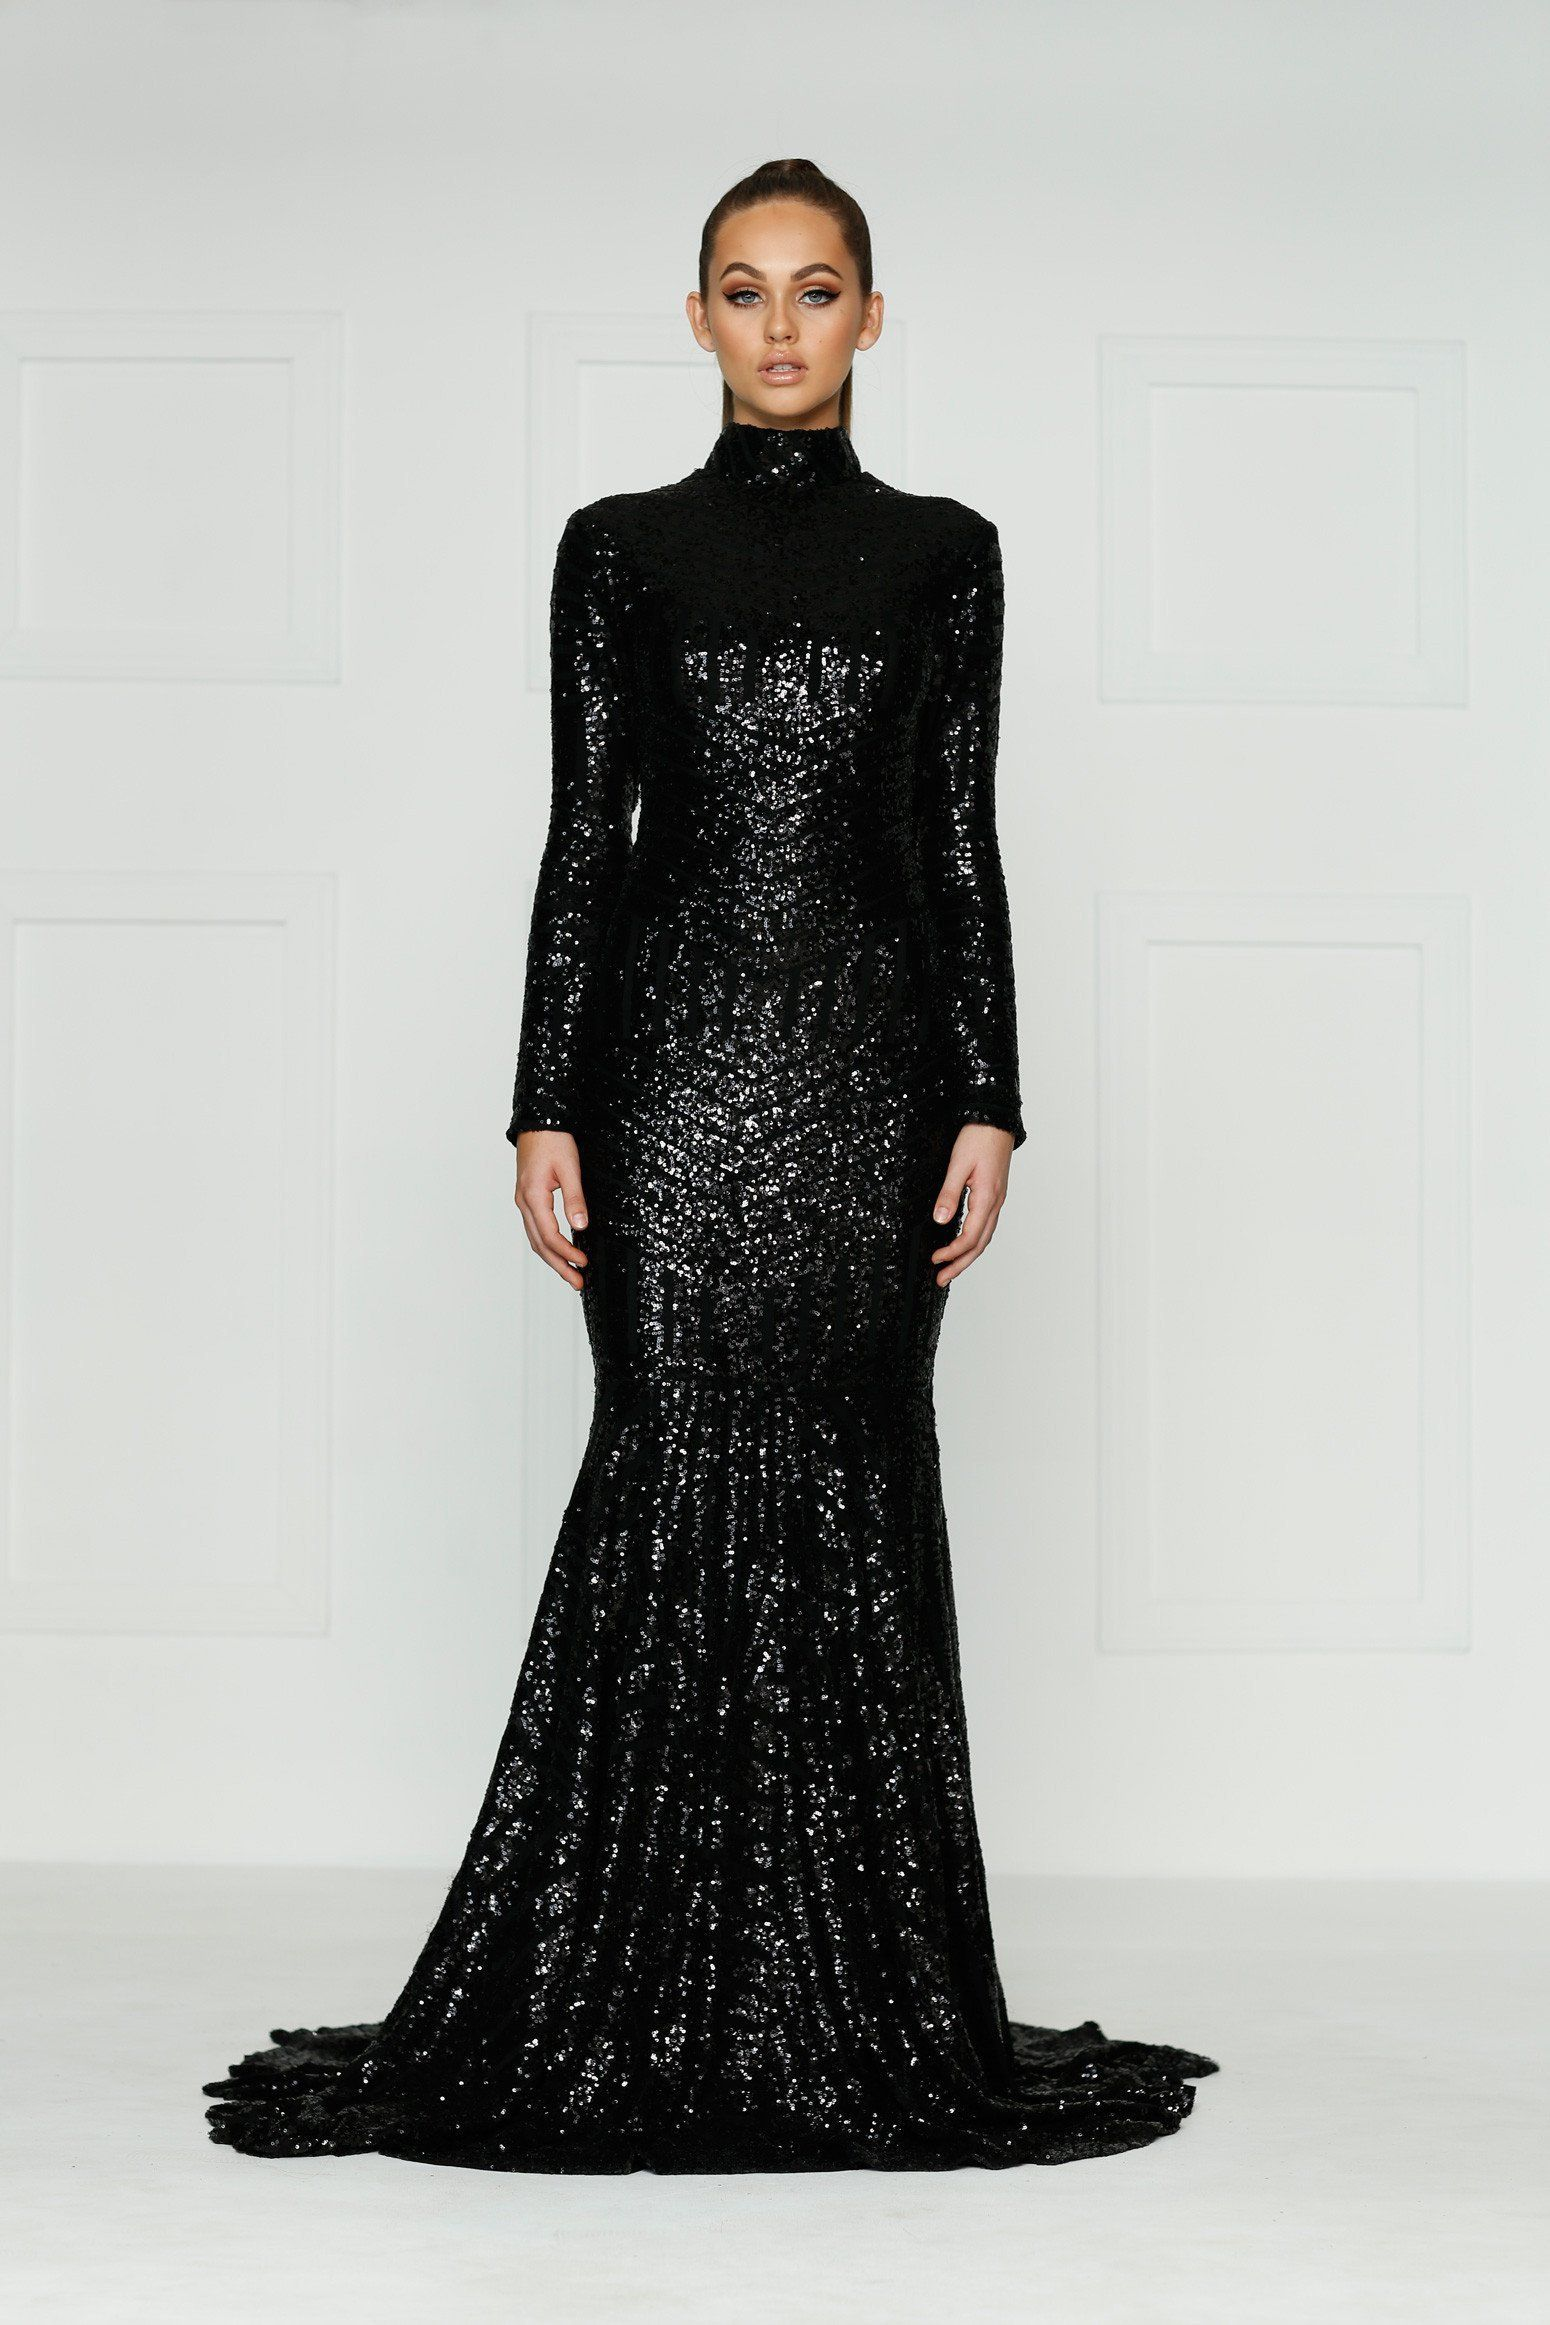 bc37fea9c5f Long Sleeve Black Sequin Prom Dress